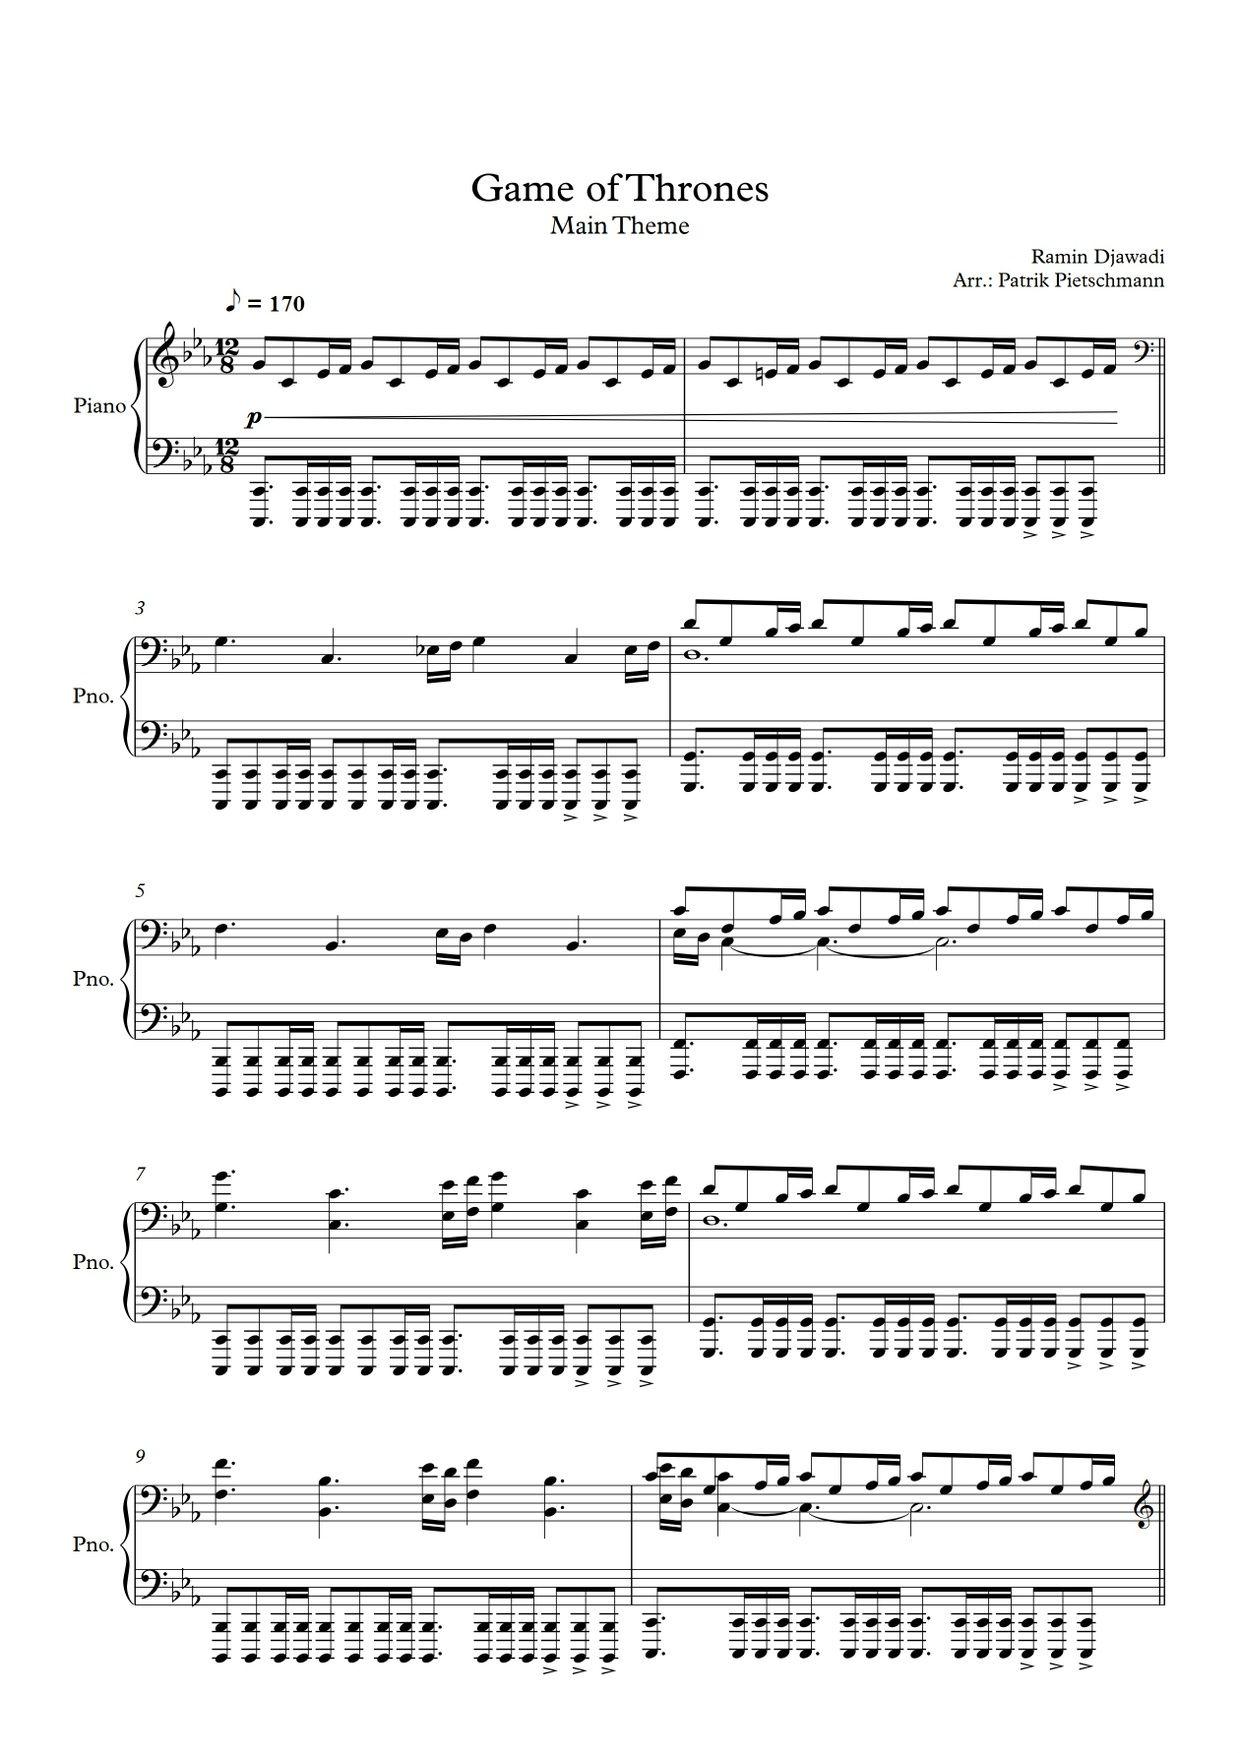 Pin by Tamu on piano notes in 2019 | Piano sheet music